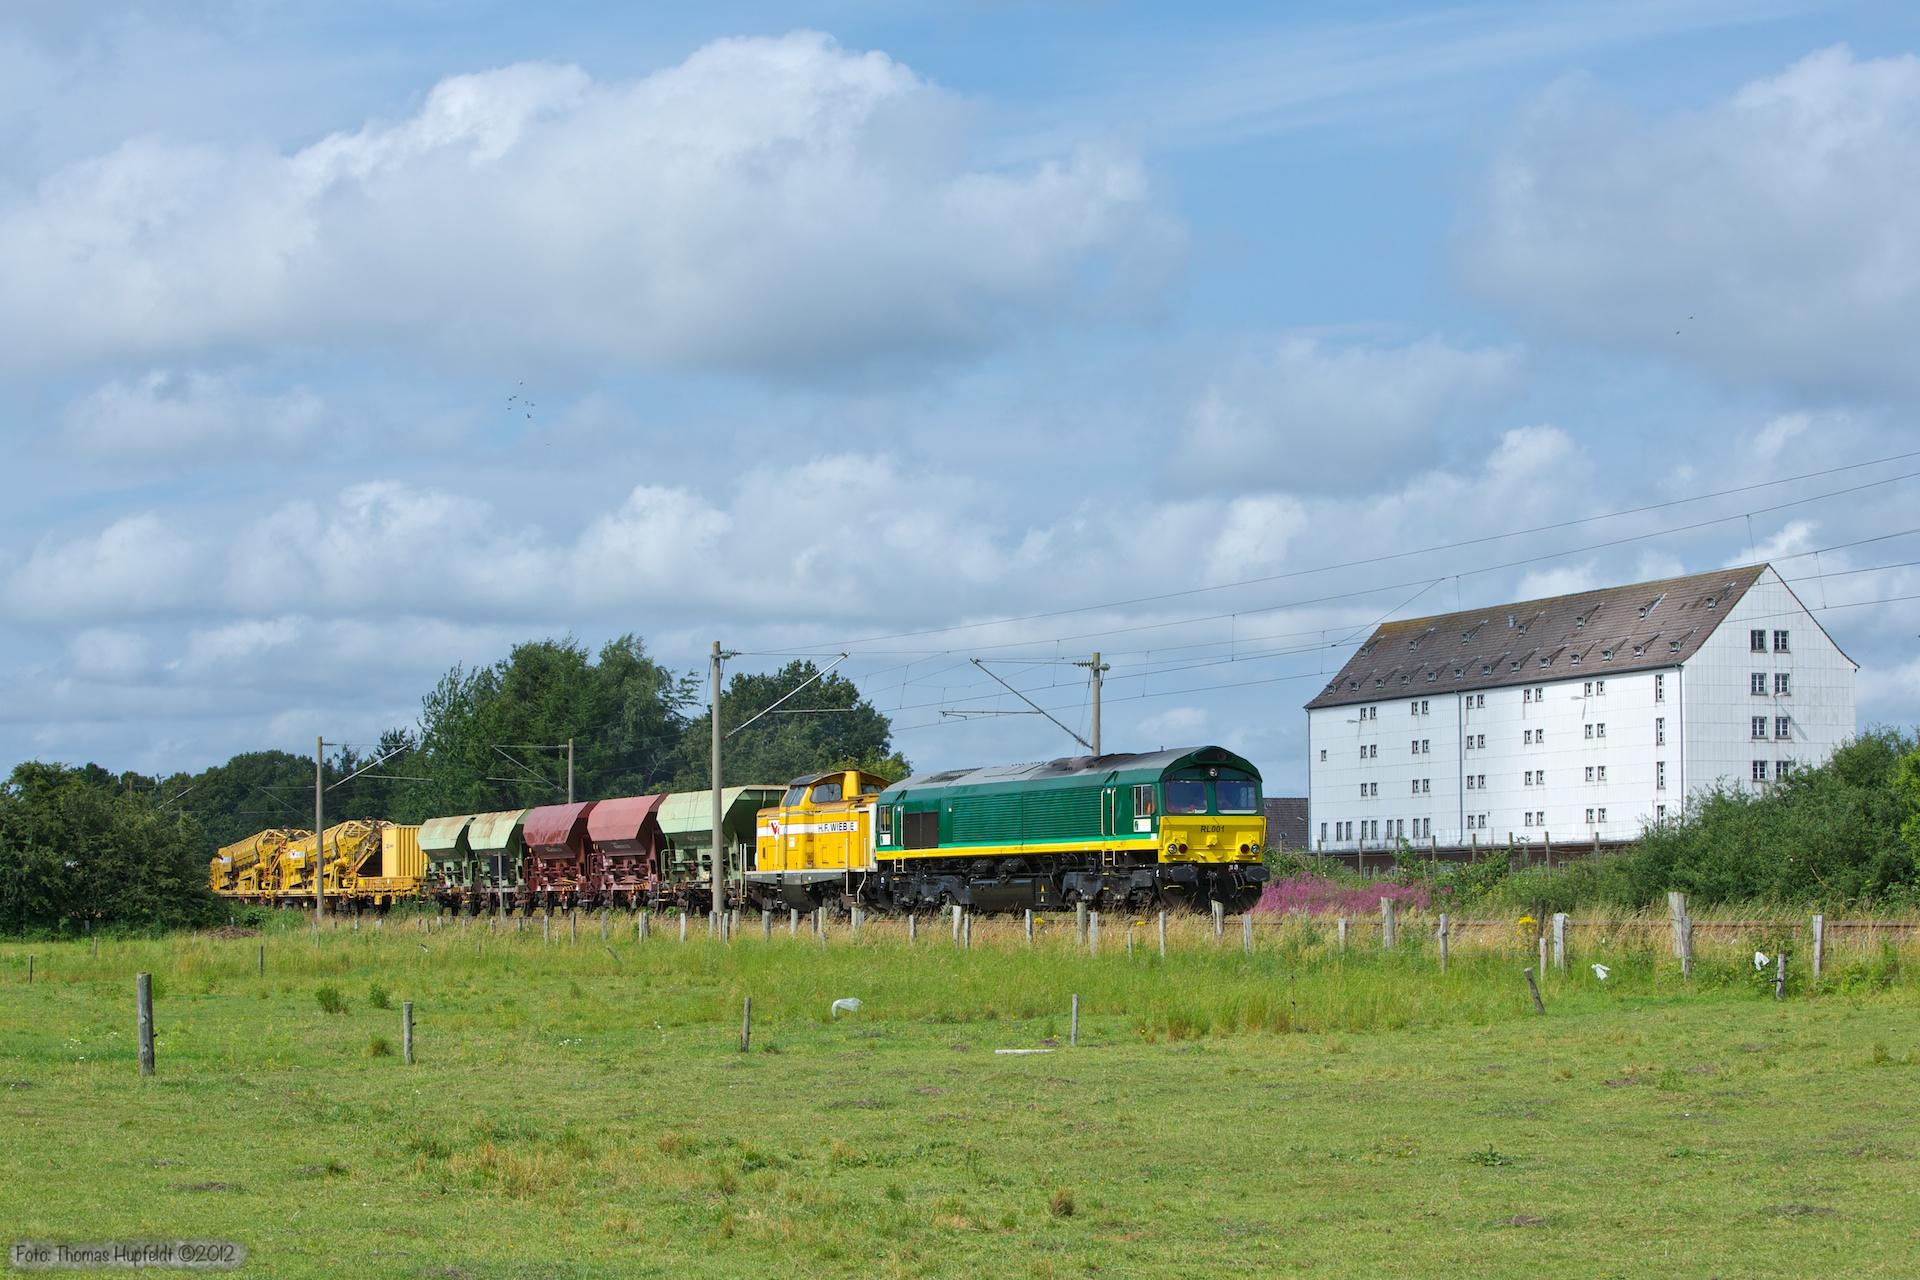 Ascendos RL001 + H.F. Wiebe Lok 4 (ex. DB 212 107-7) som DGS 95719 (Padborg - Flensburg) ved Harrislee - 28.07.2012